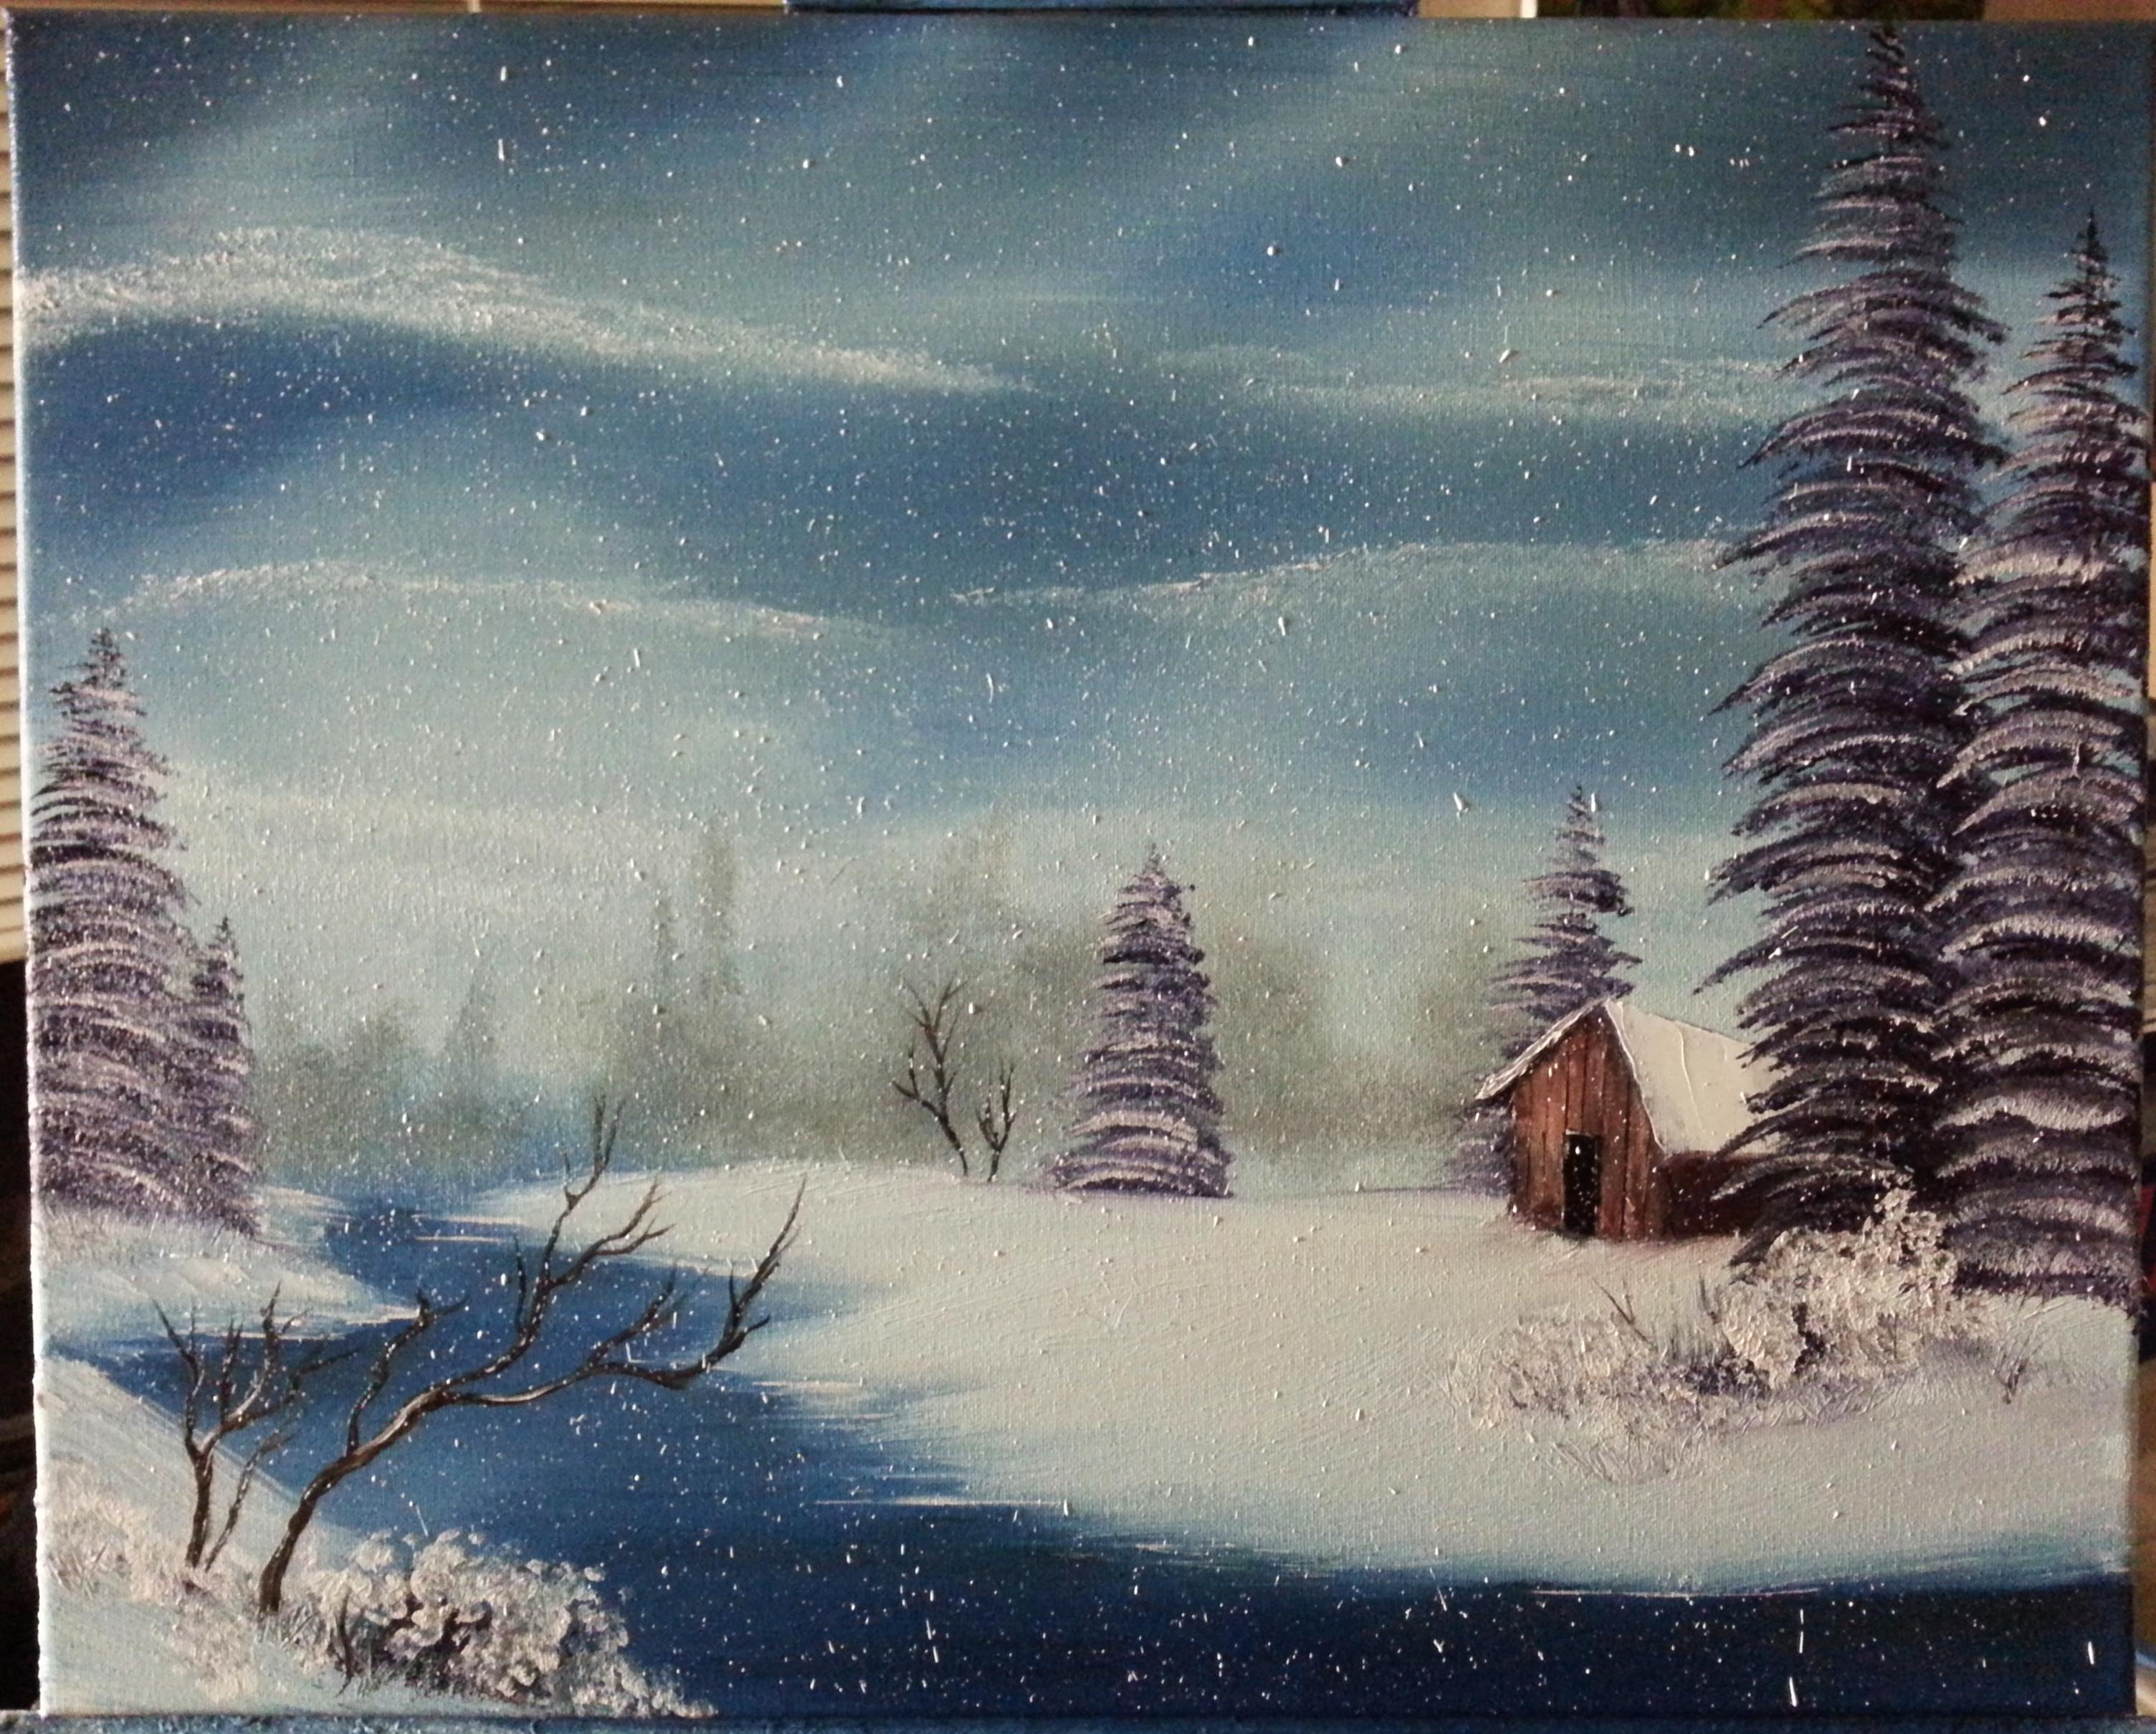 Before the Snowfall